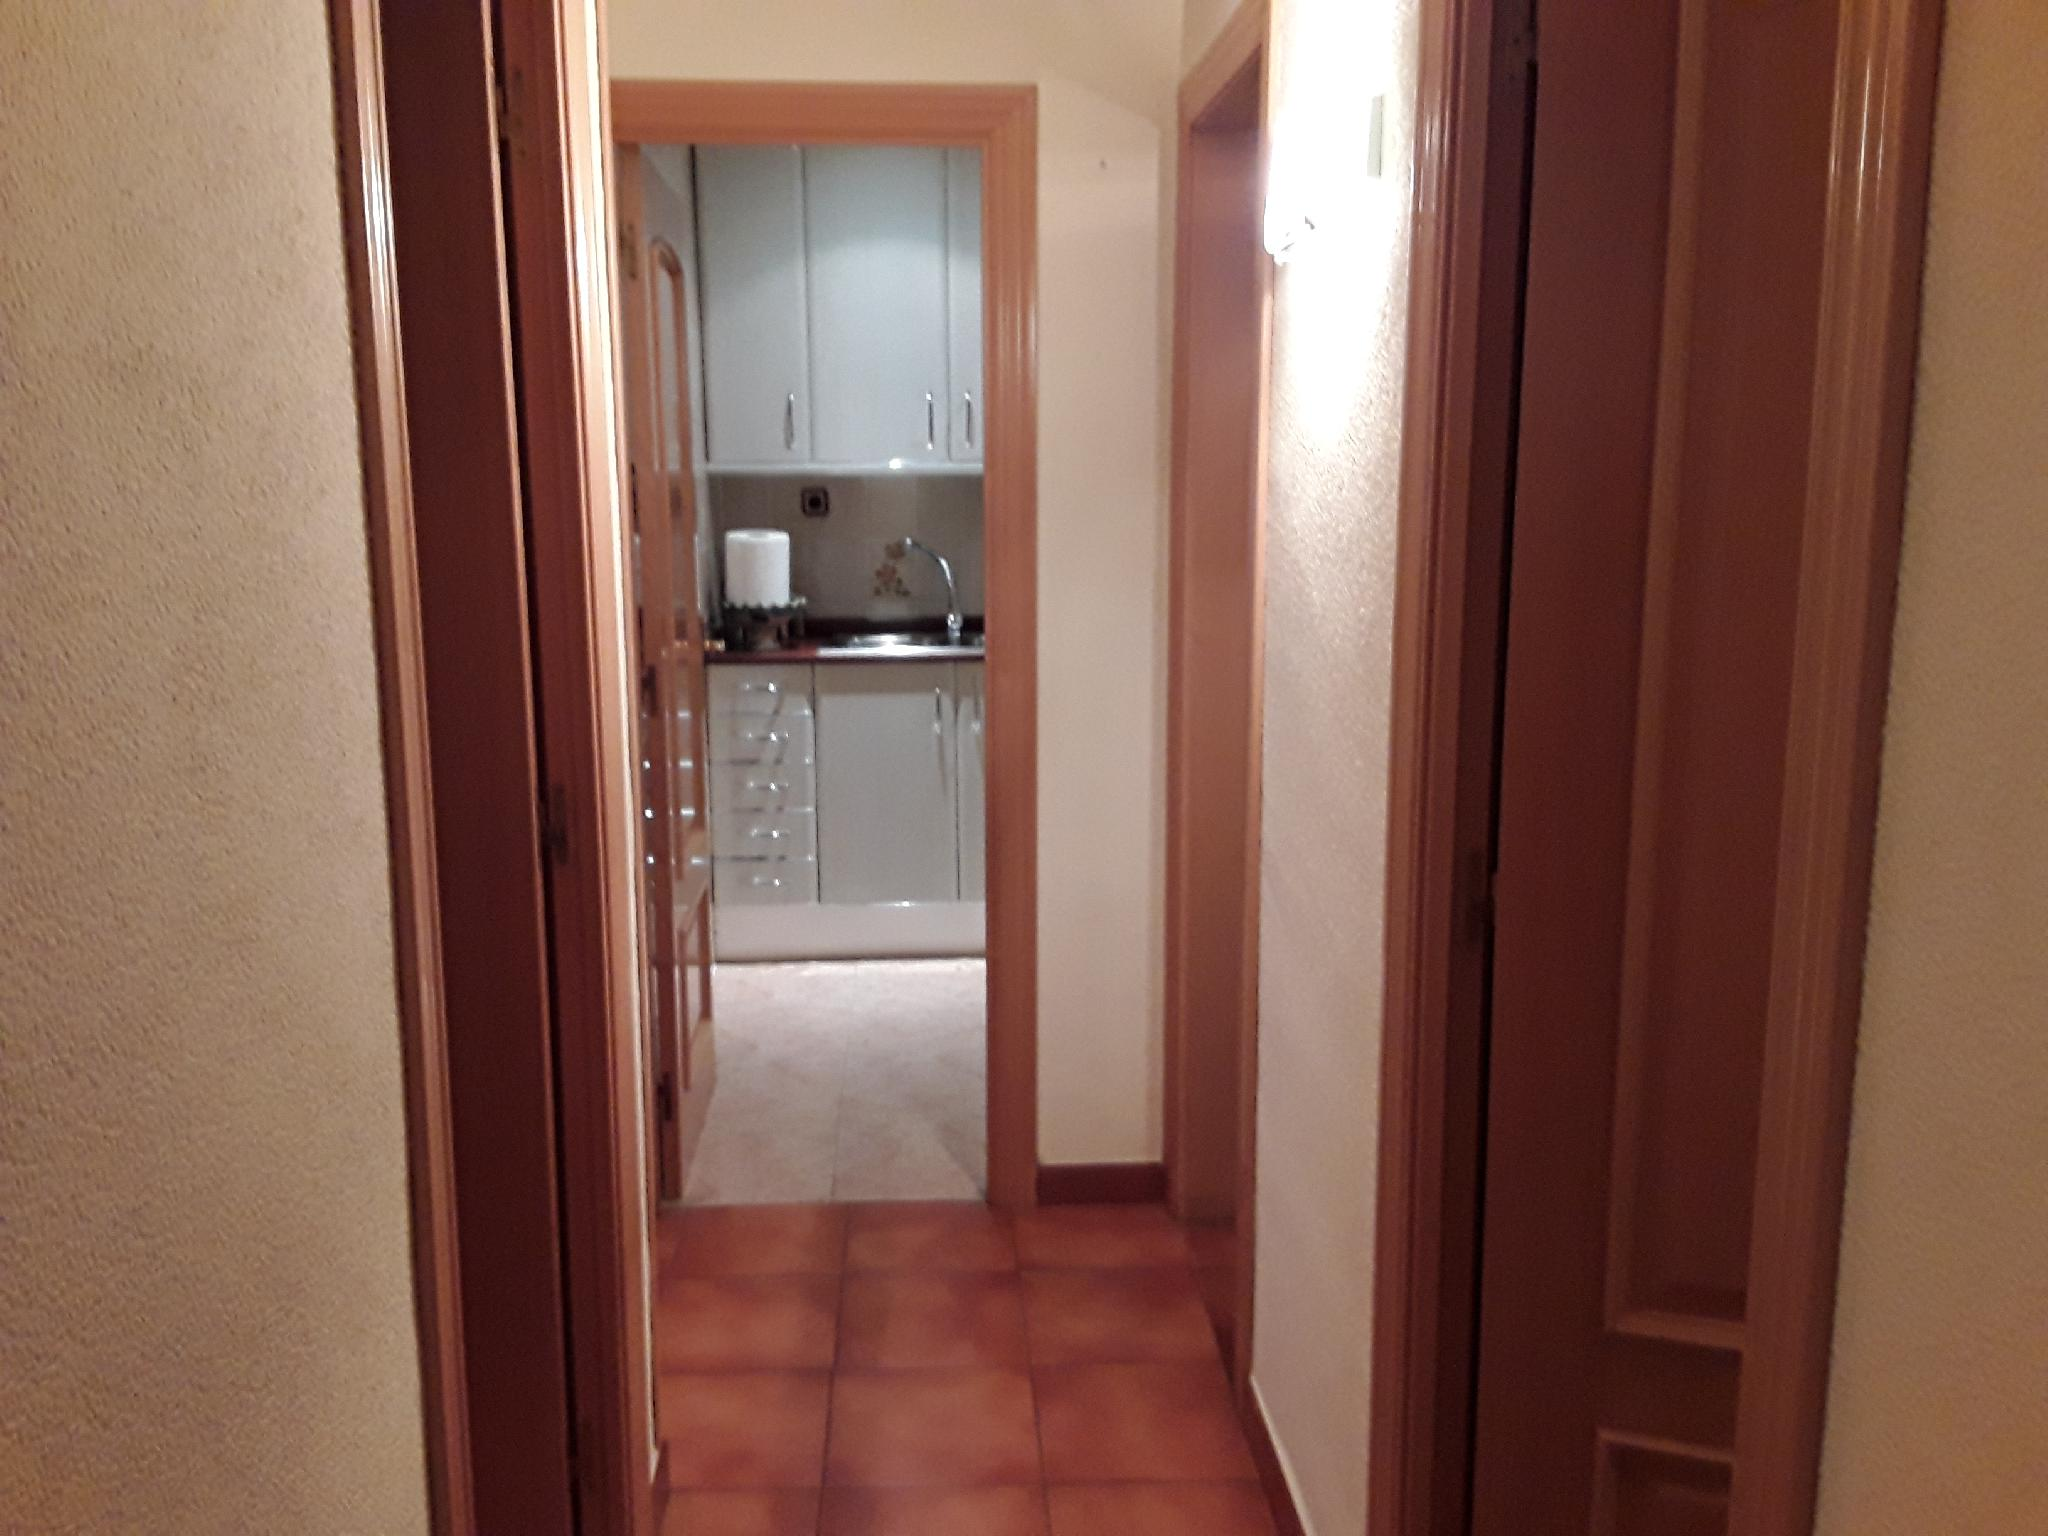 Venta De Casas Y Pisos En Hospitalet De Llobregat L Donpiso